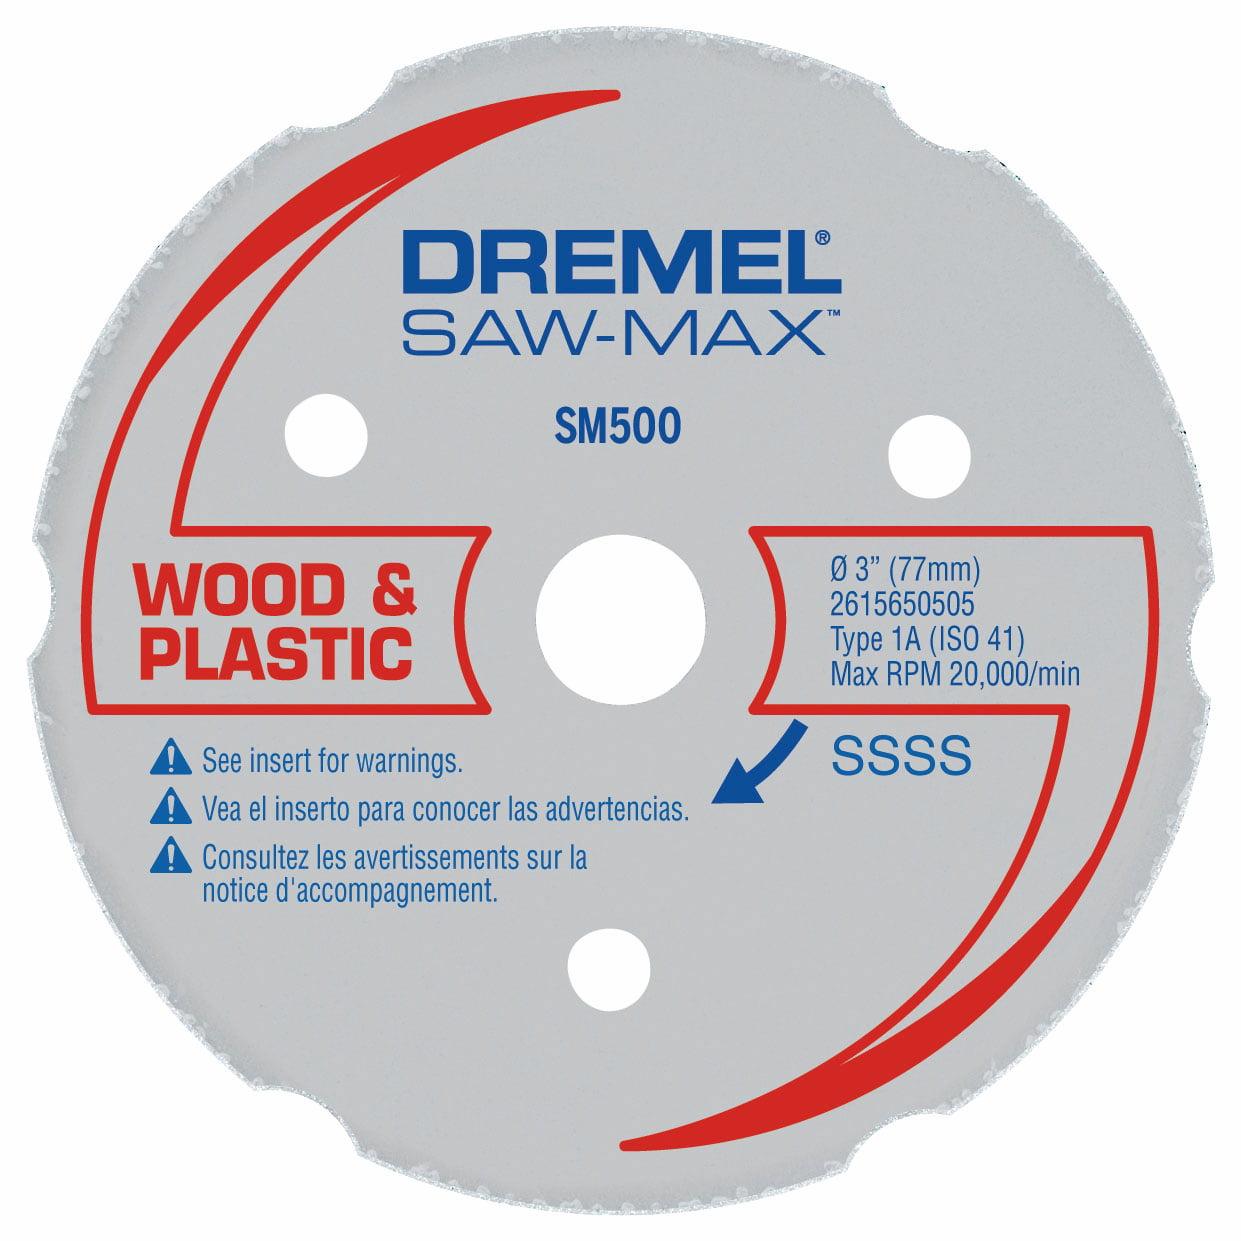 Dremel SM500 Saw-Max 3 inch Carbide Multi-Purpose Wheel for Wood, Plywood, Composites, Laminate Flooring, Drywall, PVC, and Plastics